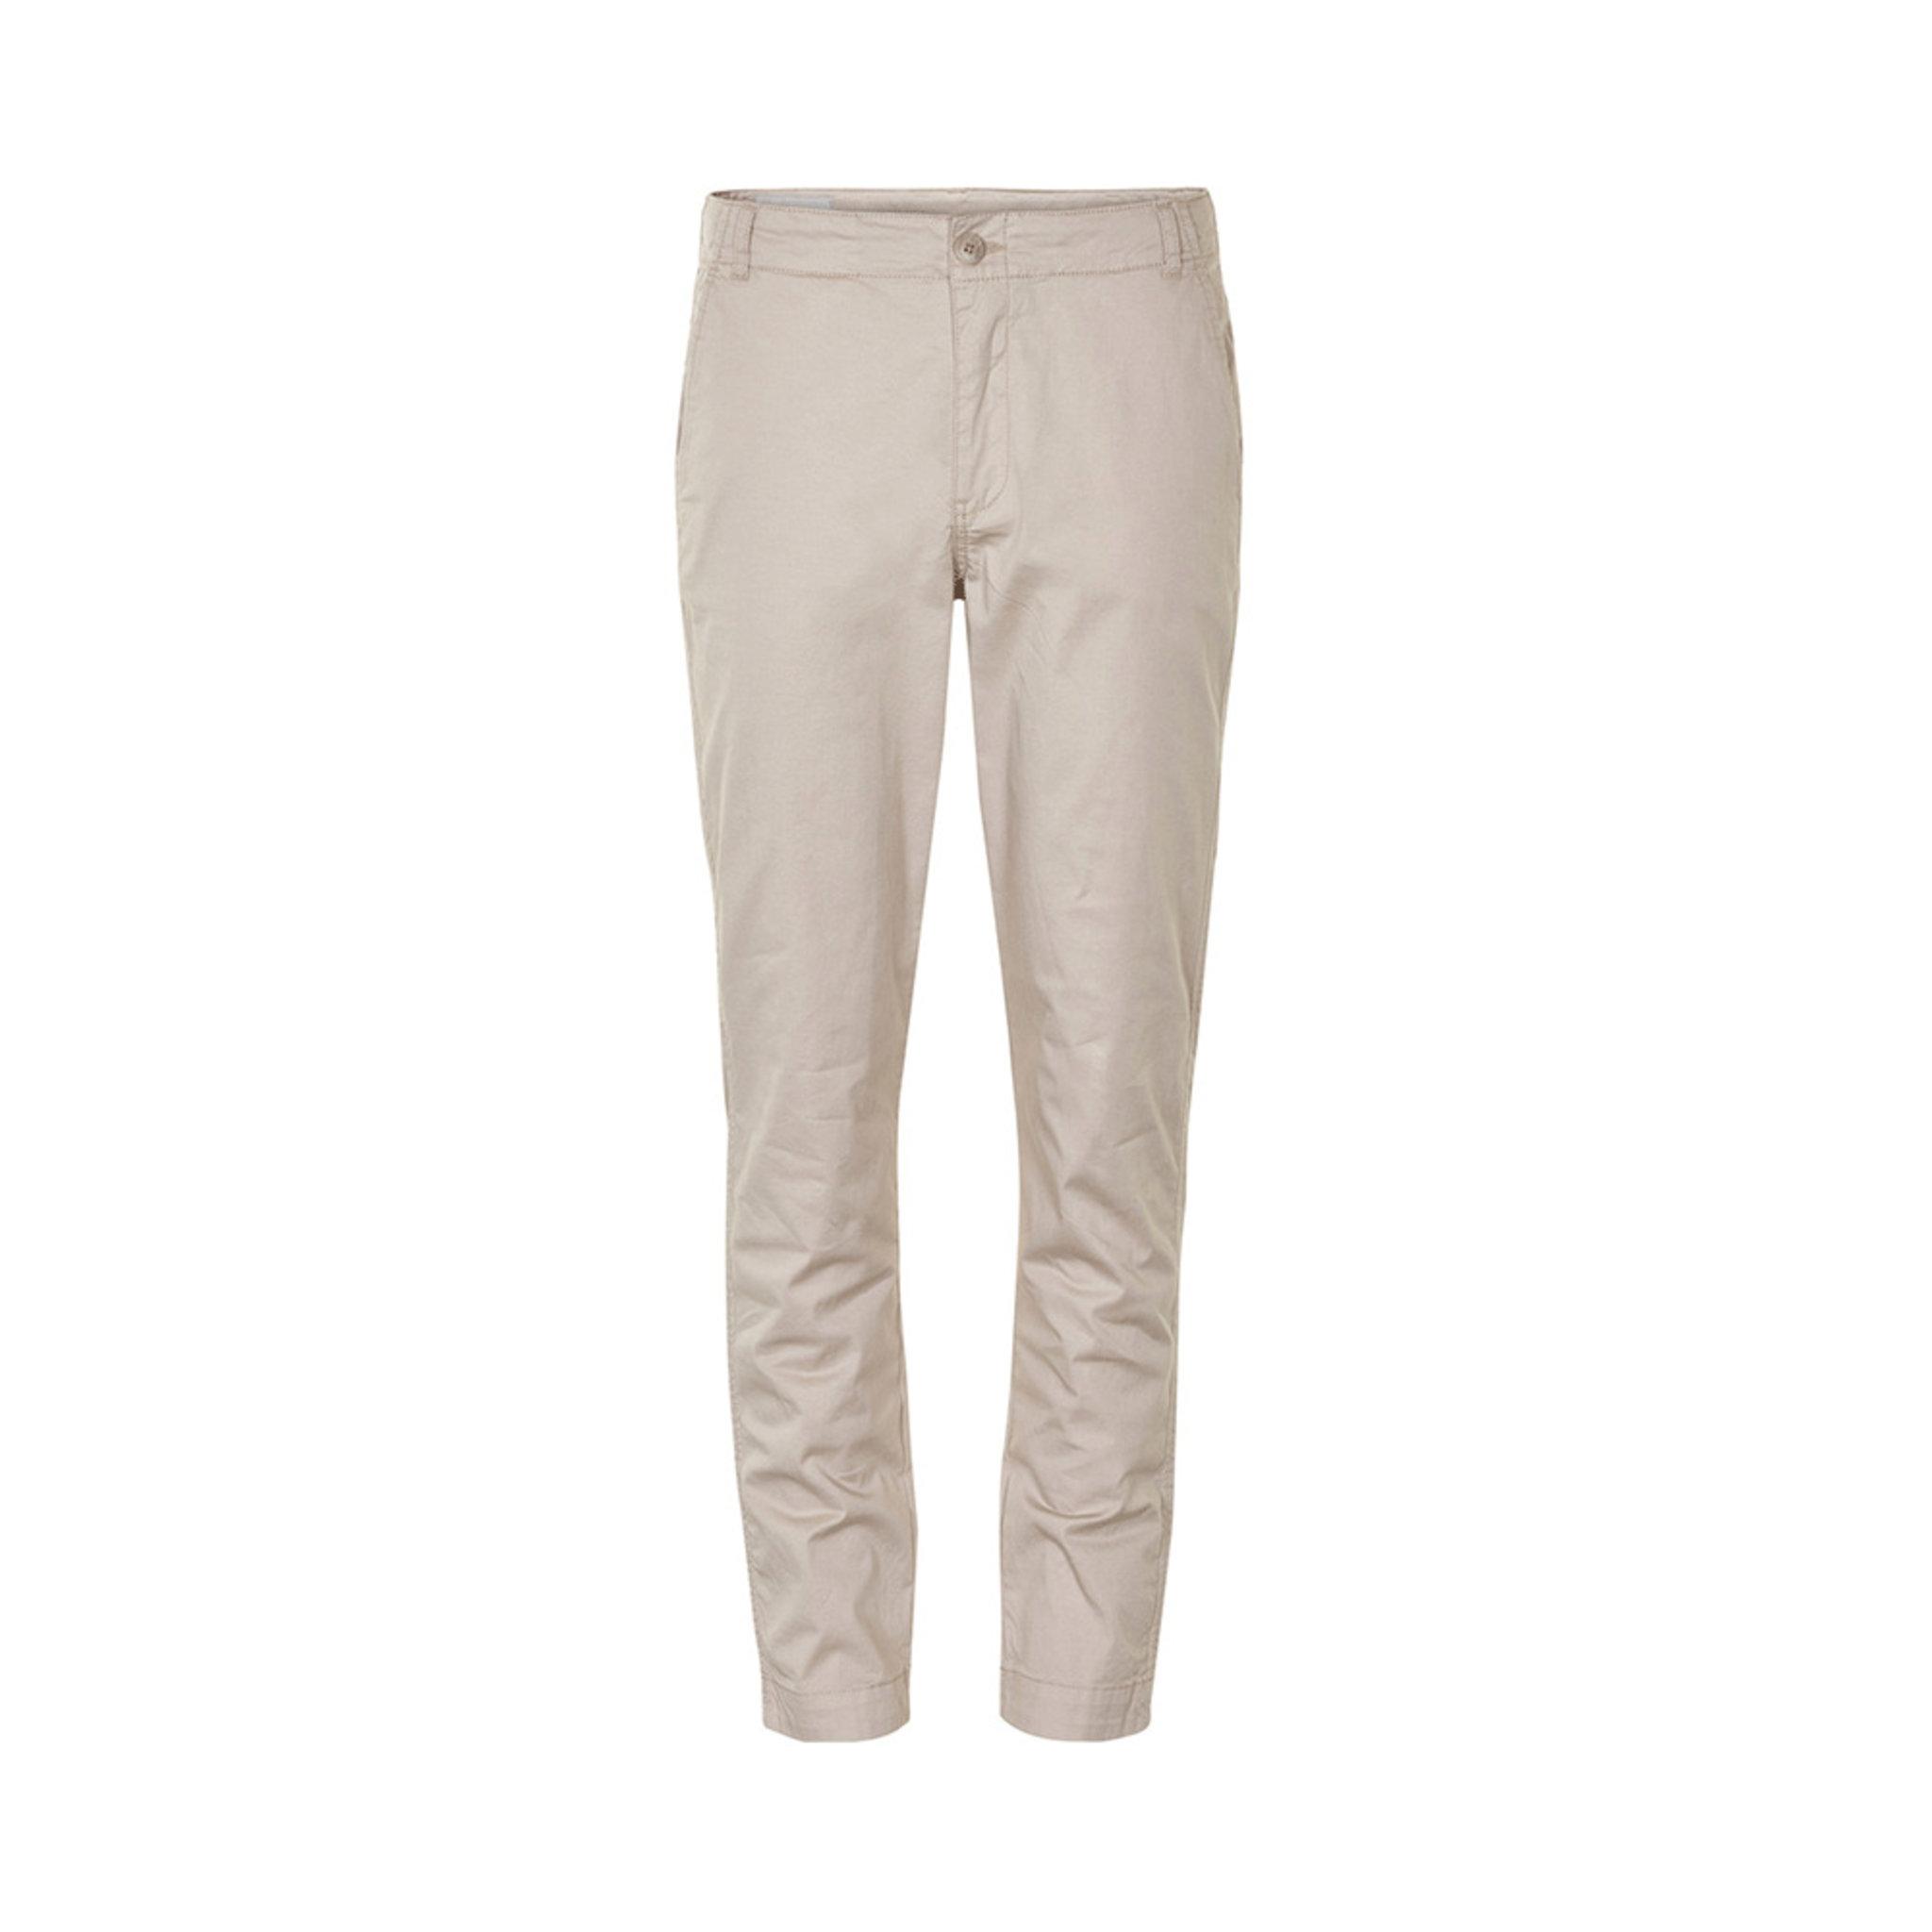 Nolona Chino Pants - Byxor - Köp online på åhlens.se! c9d83d162eb70